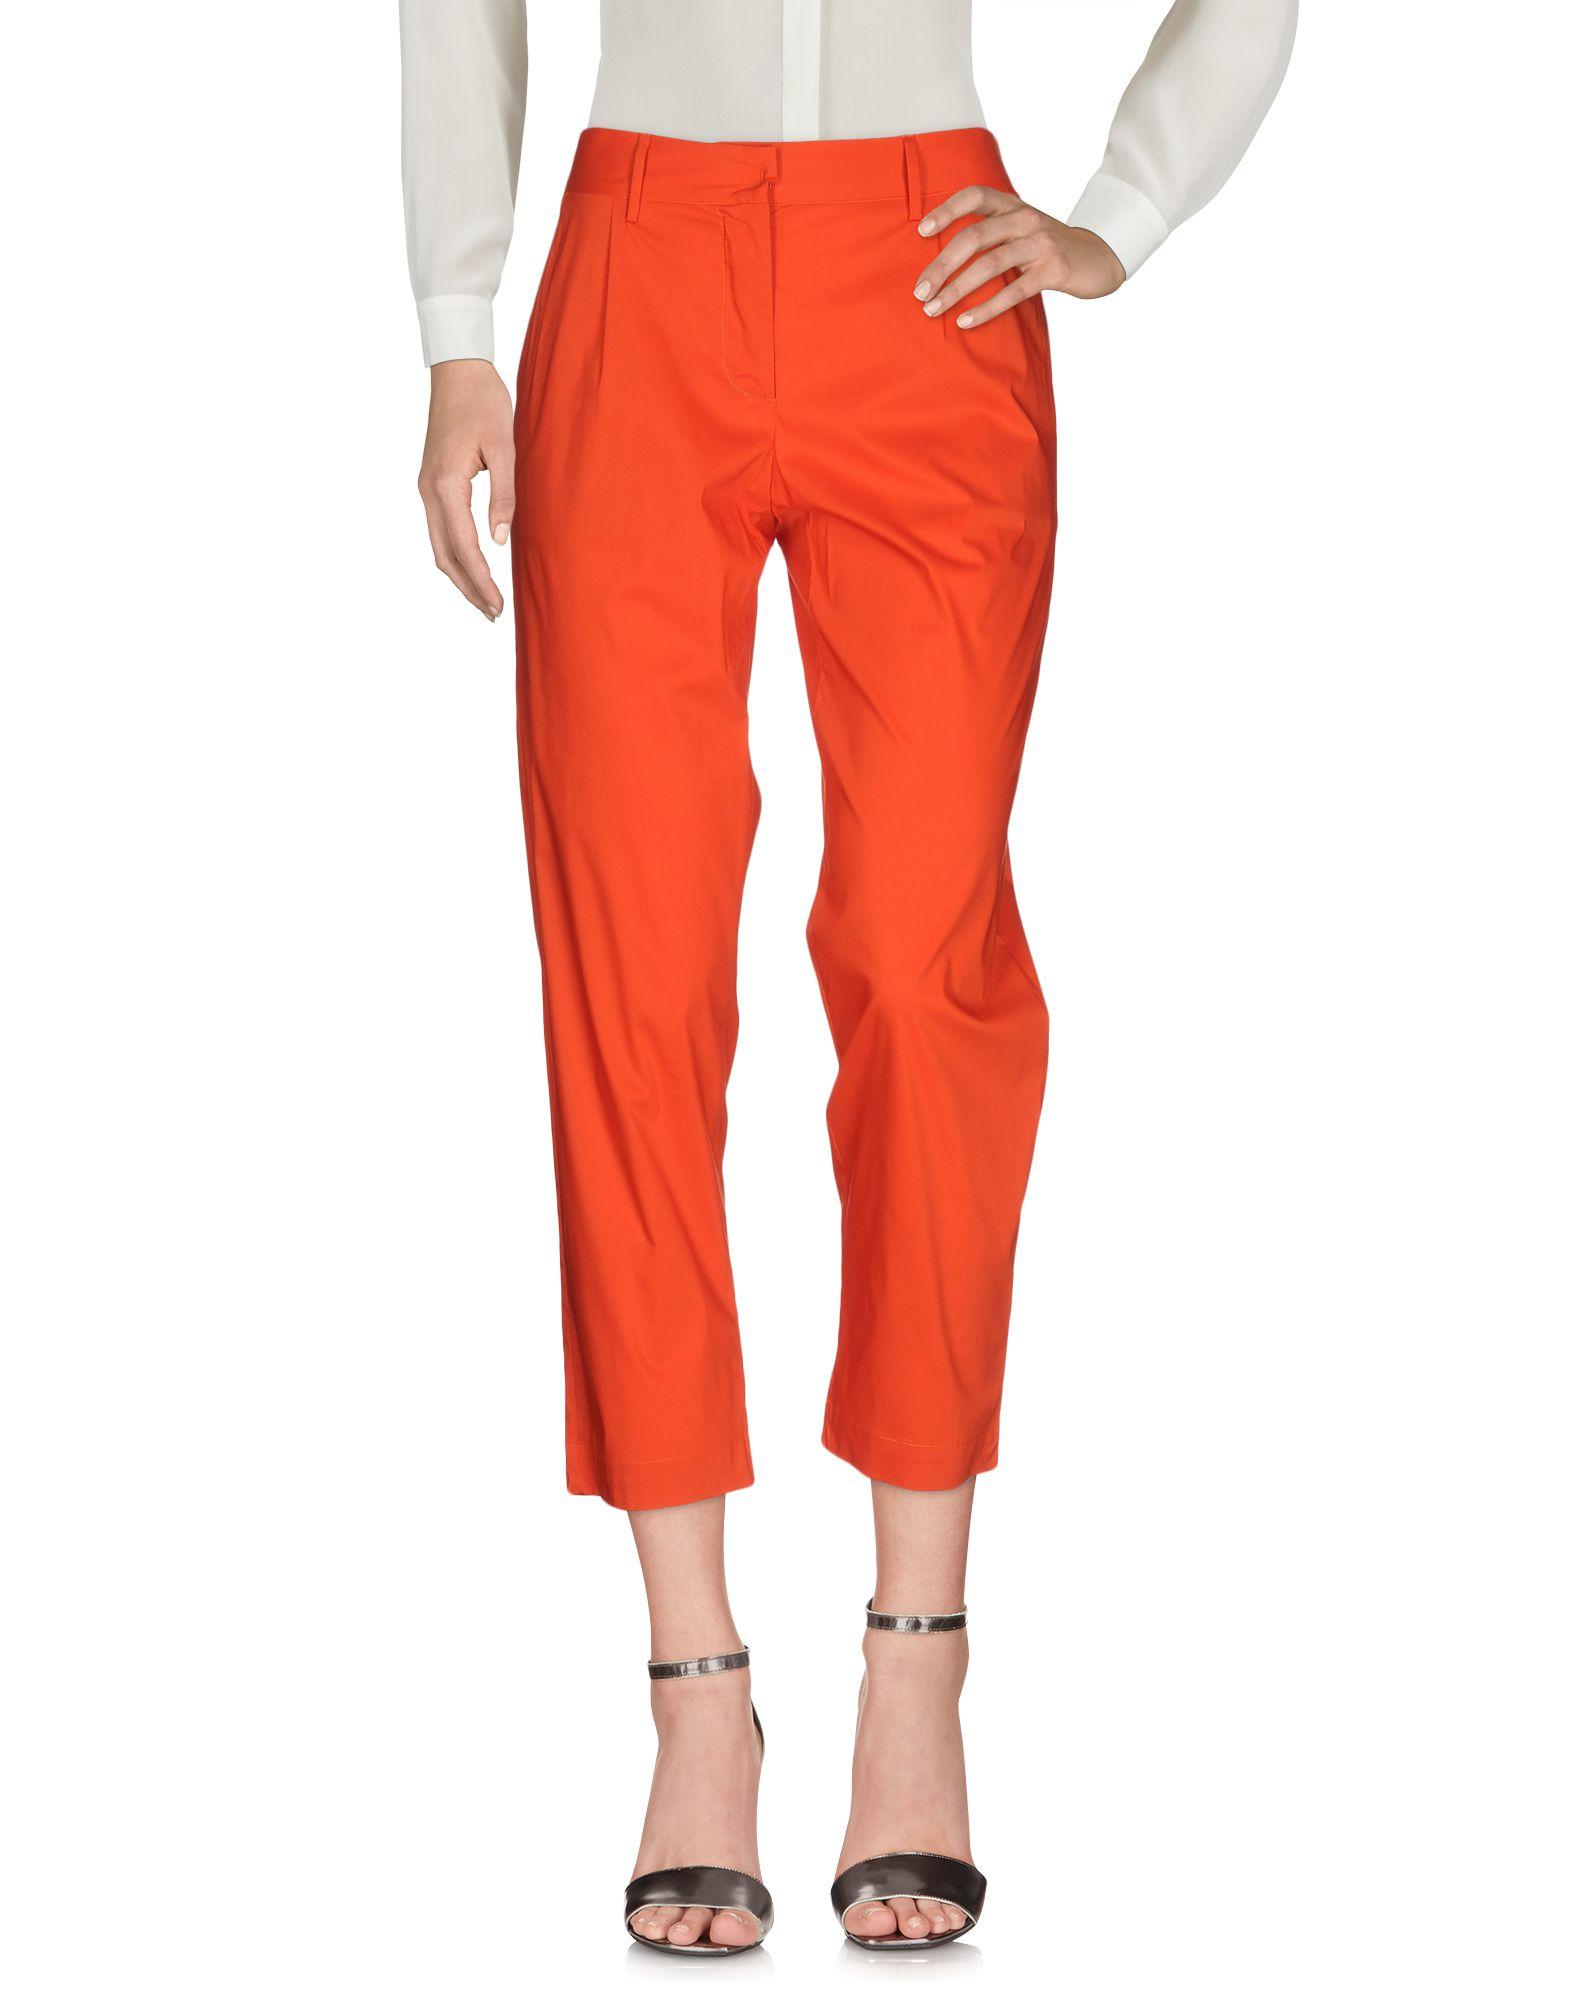 LIVIANA CONTI Damen Hose Farbe Orange Größe 6